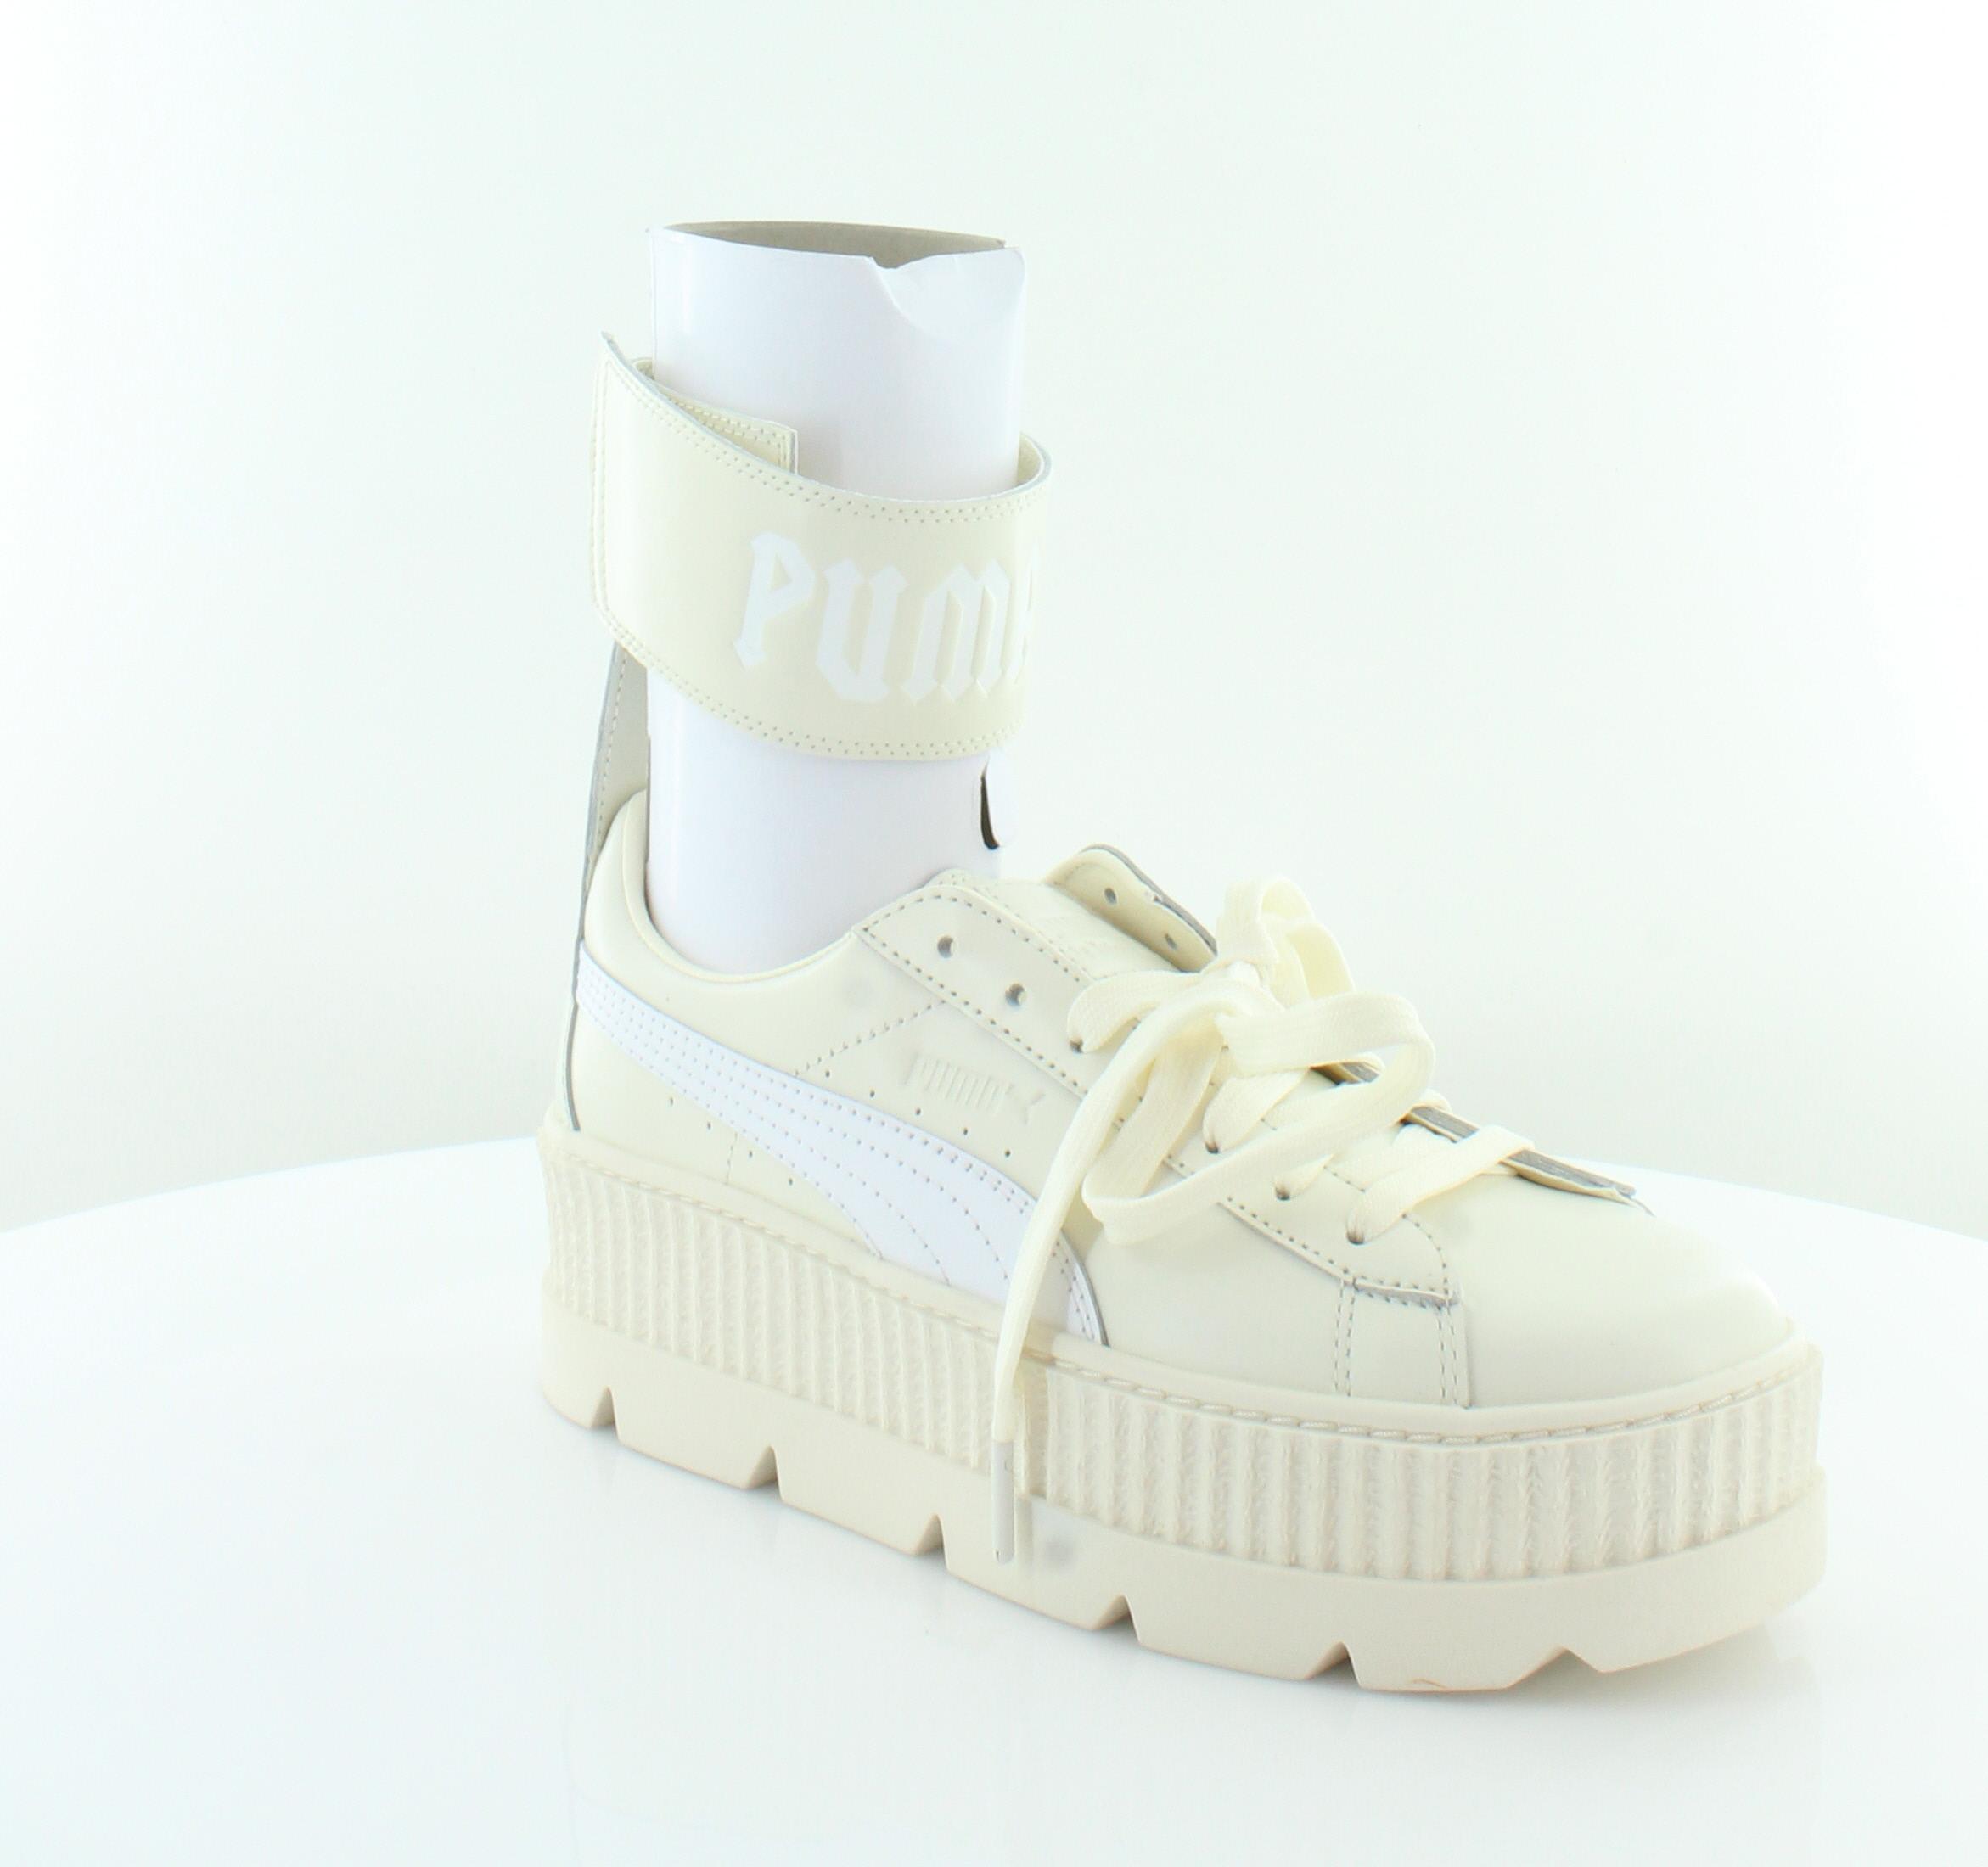 febf896f3d7f98 Fenty Puma x Rihanna Ankle Strap Ivory Womens Shoes 10 M Fashion Sneakers